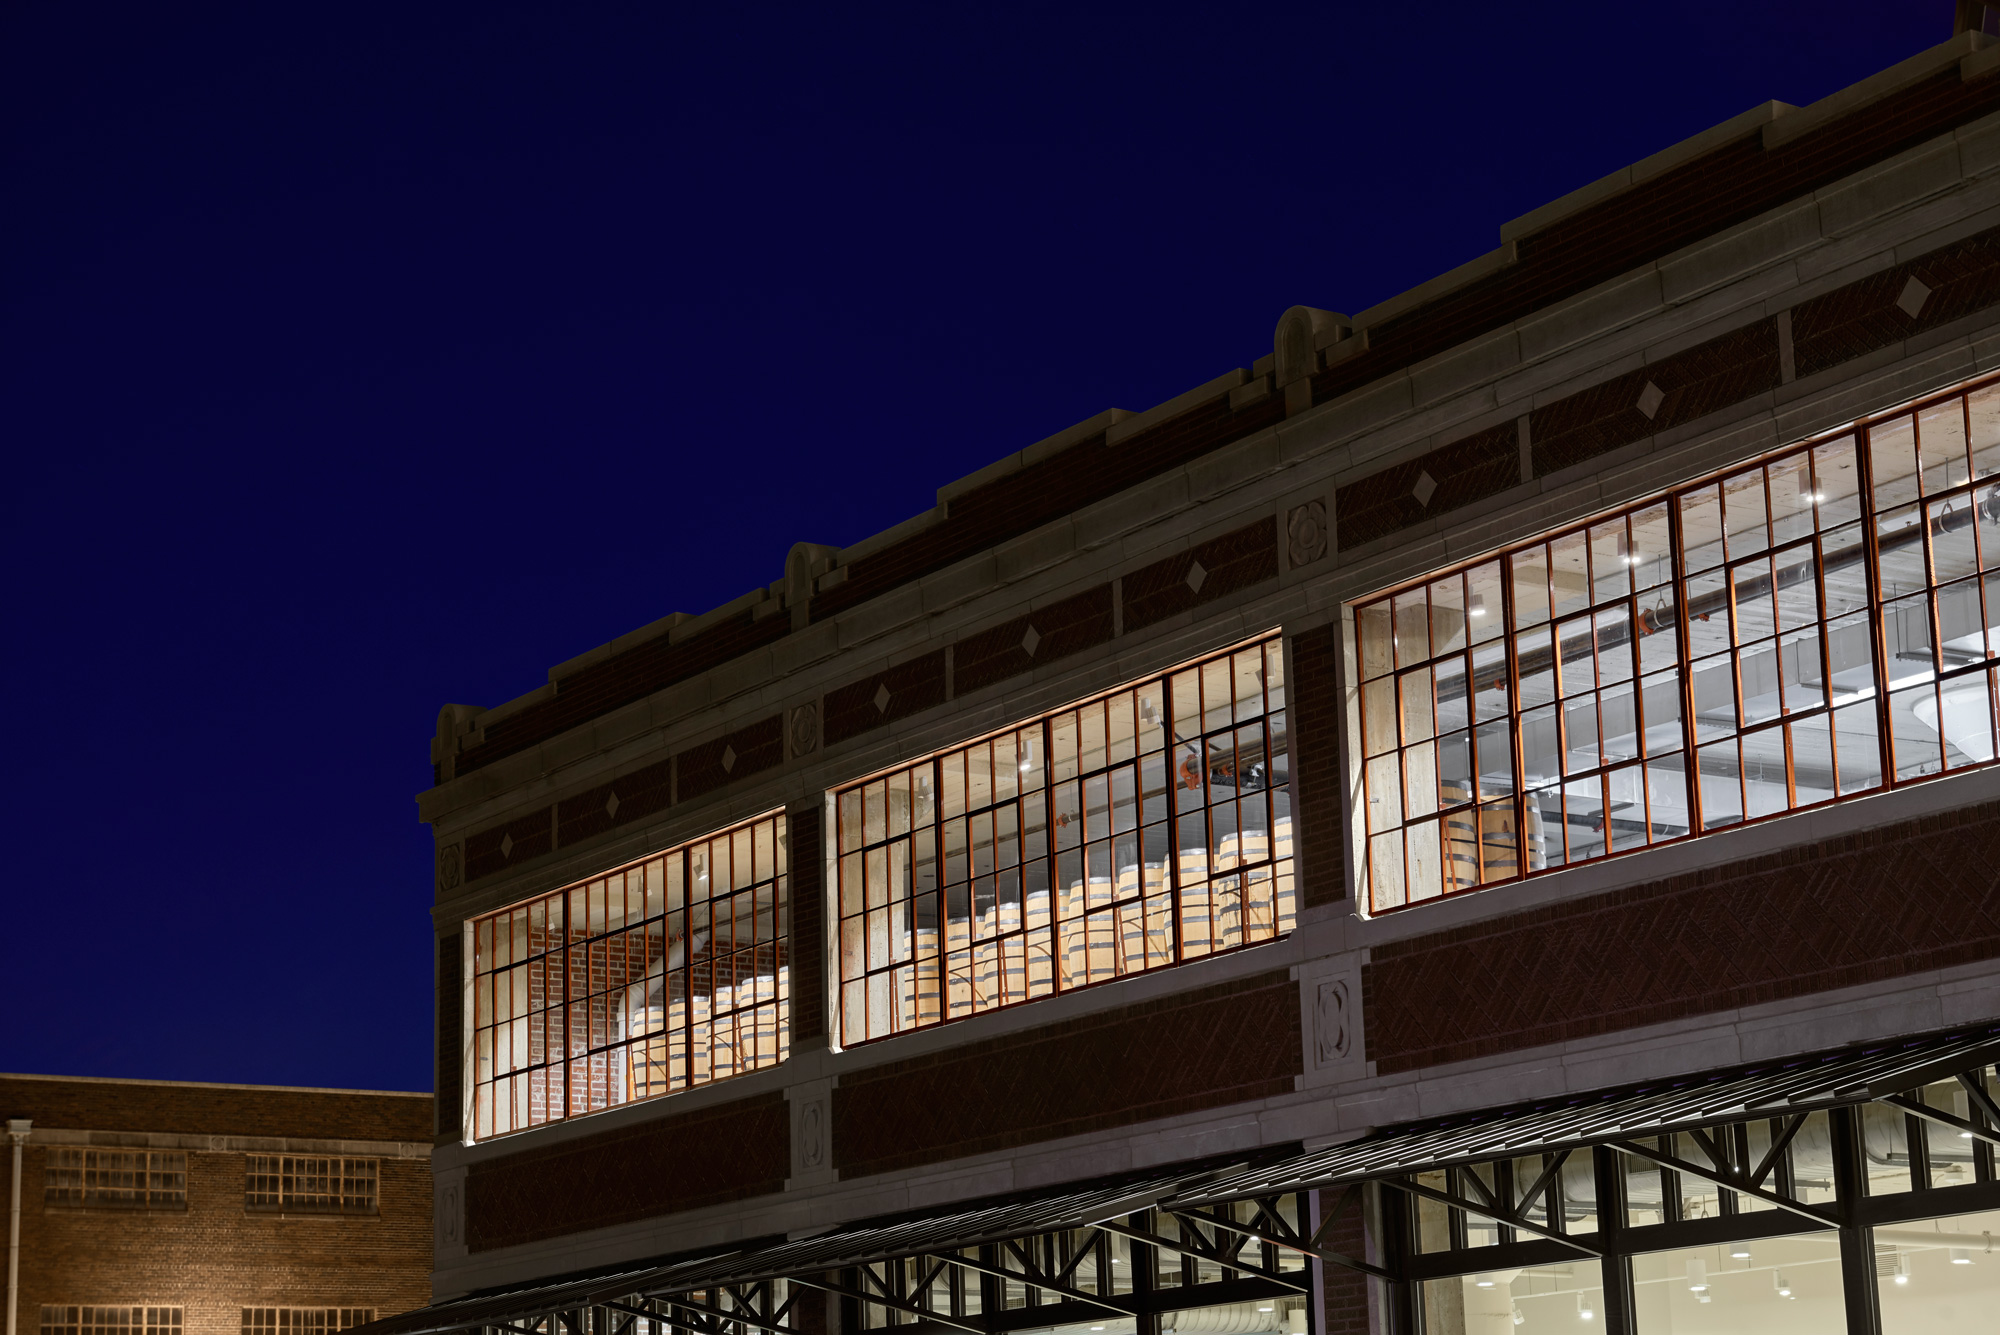 McGinn-Photography-Old-Dominick-Memphis-Exterior-Shot-2.web.jpg